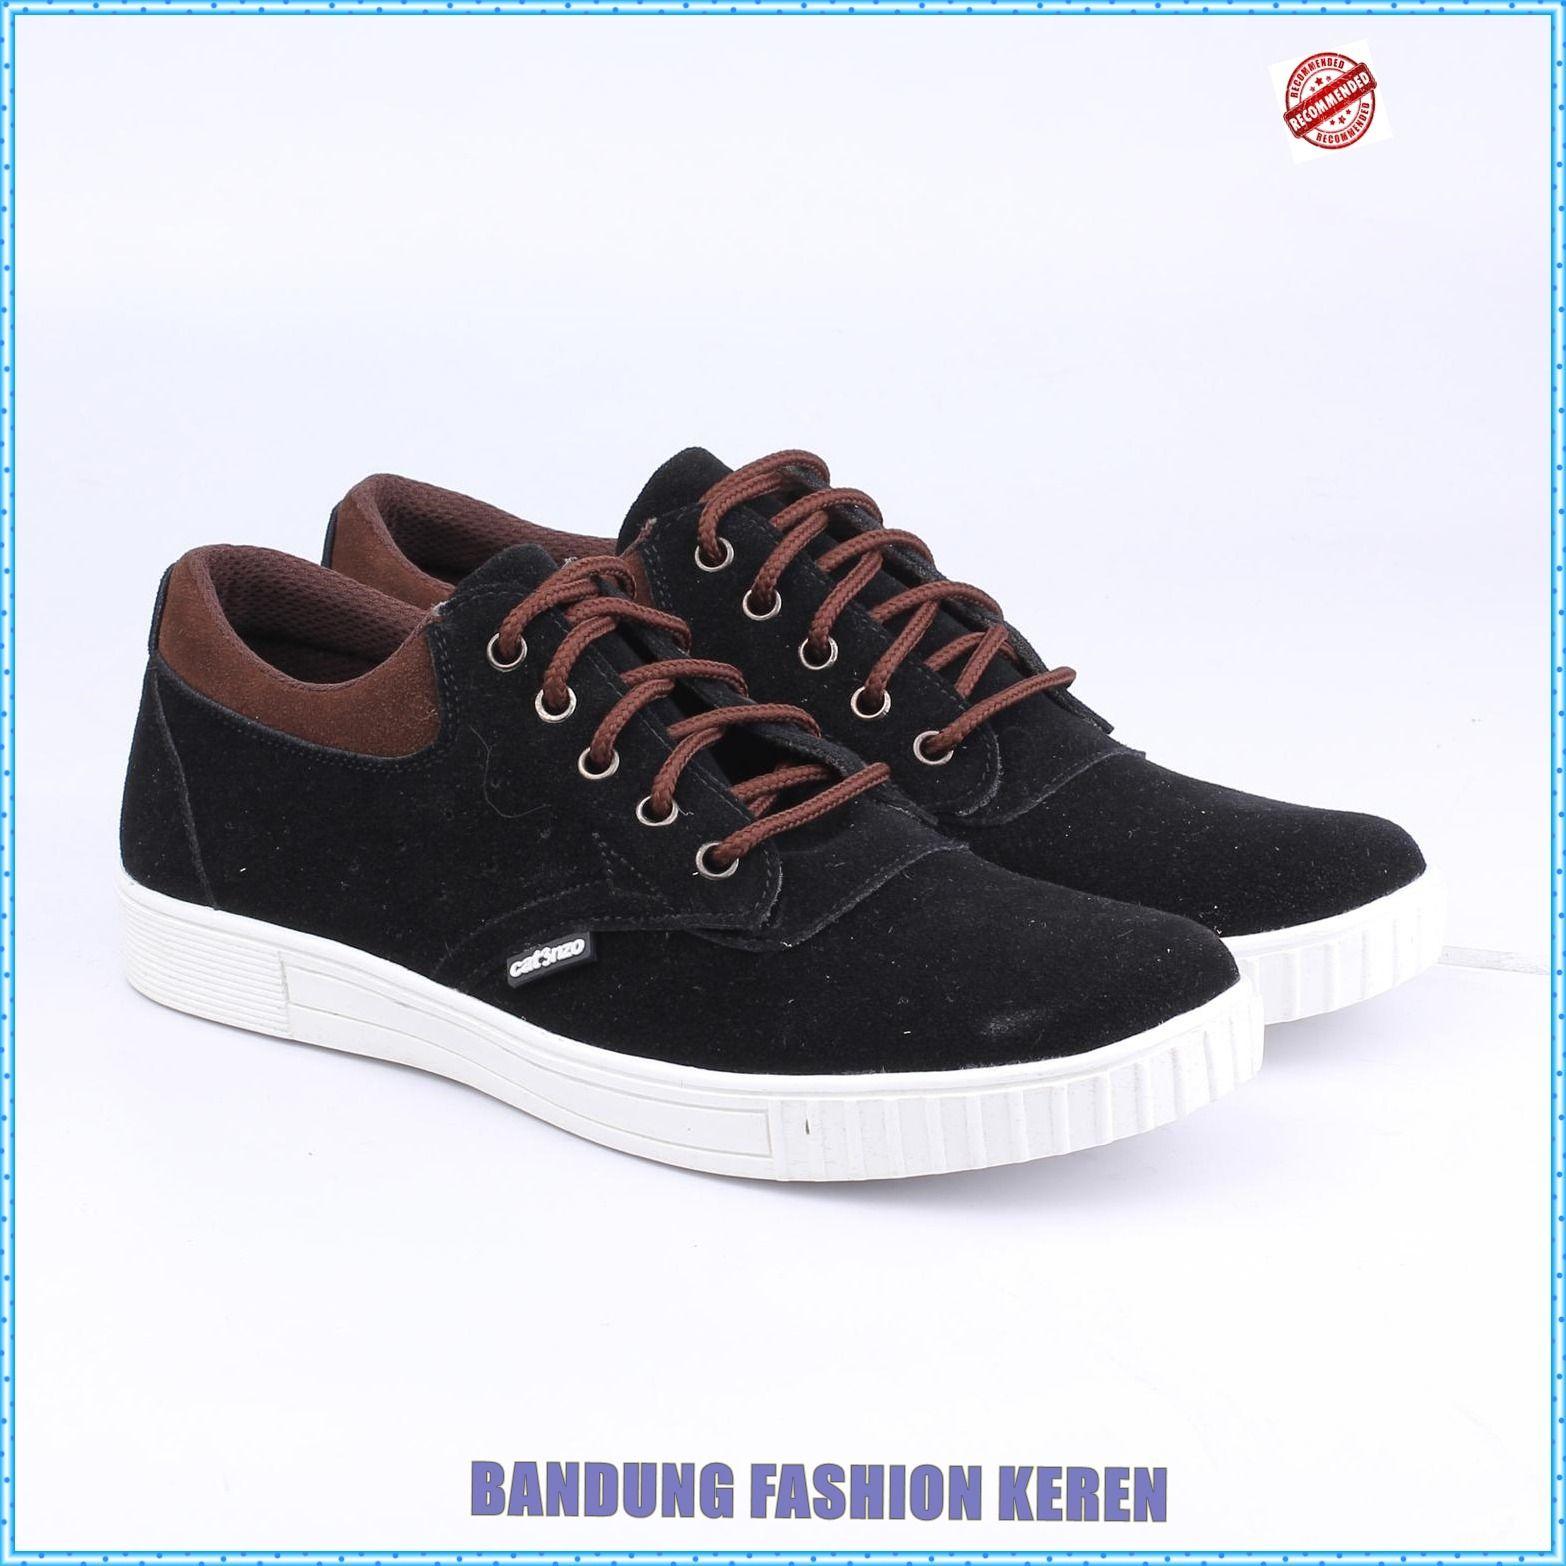 Sepatu Casual Pria Ny 084 Produk Fashion Handmade Terbaik 100